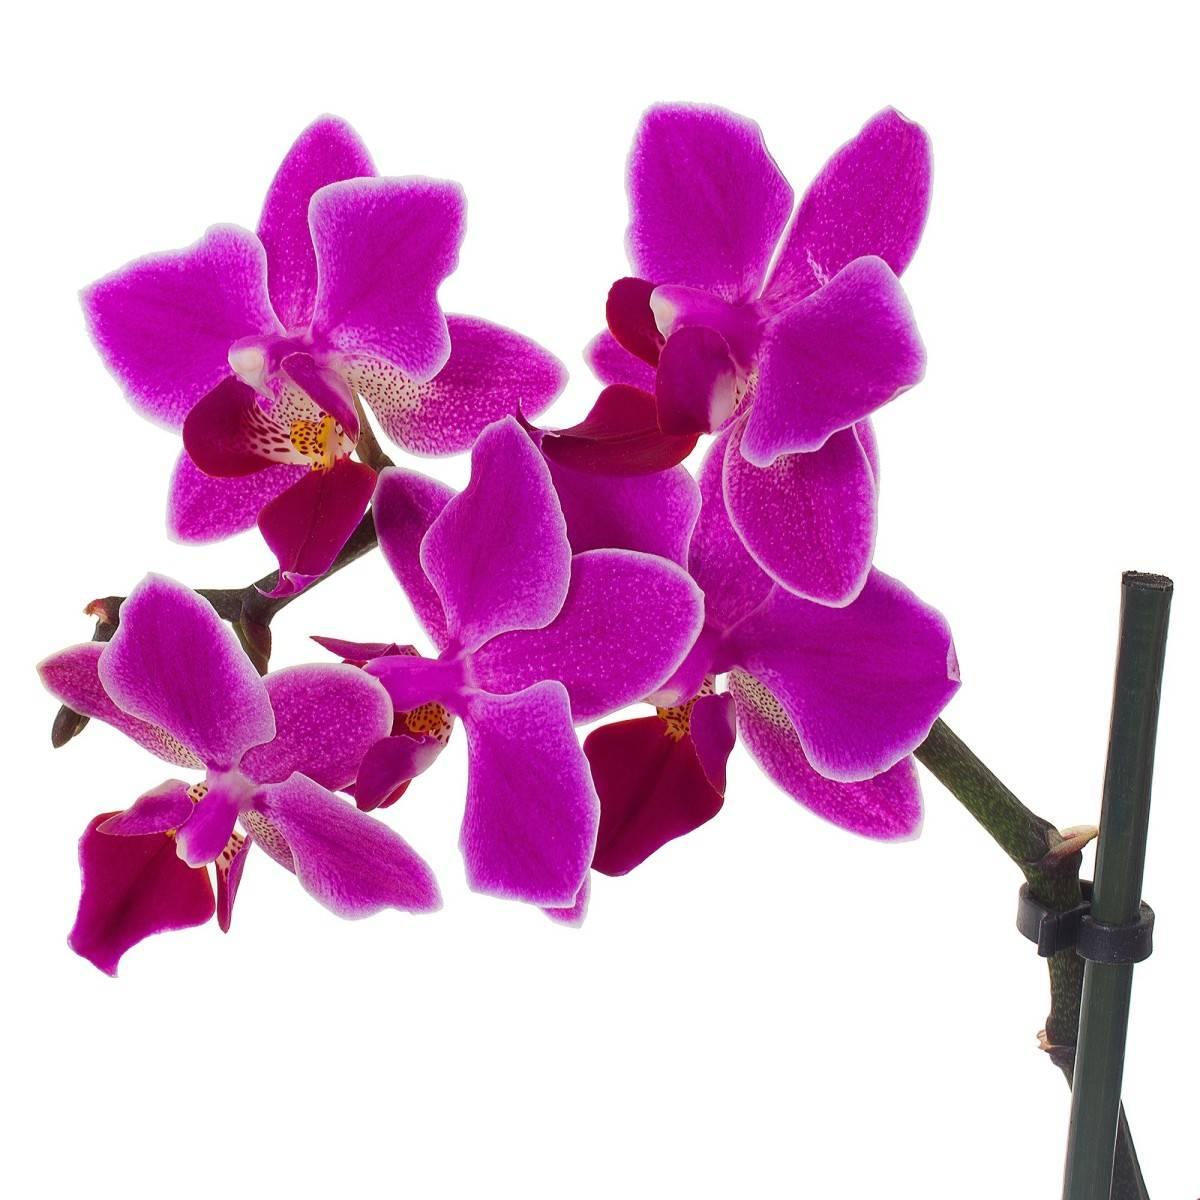 Фаленопсис стюарта: фото и описание орхидеи стюартиана пико чип